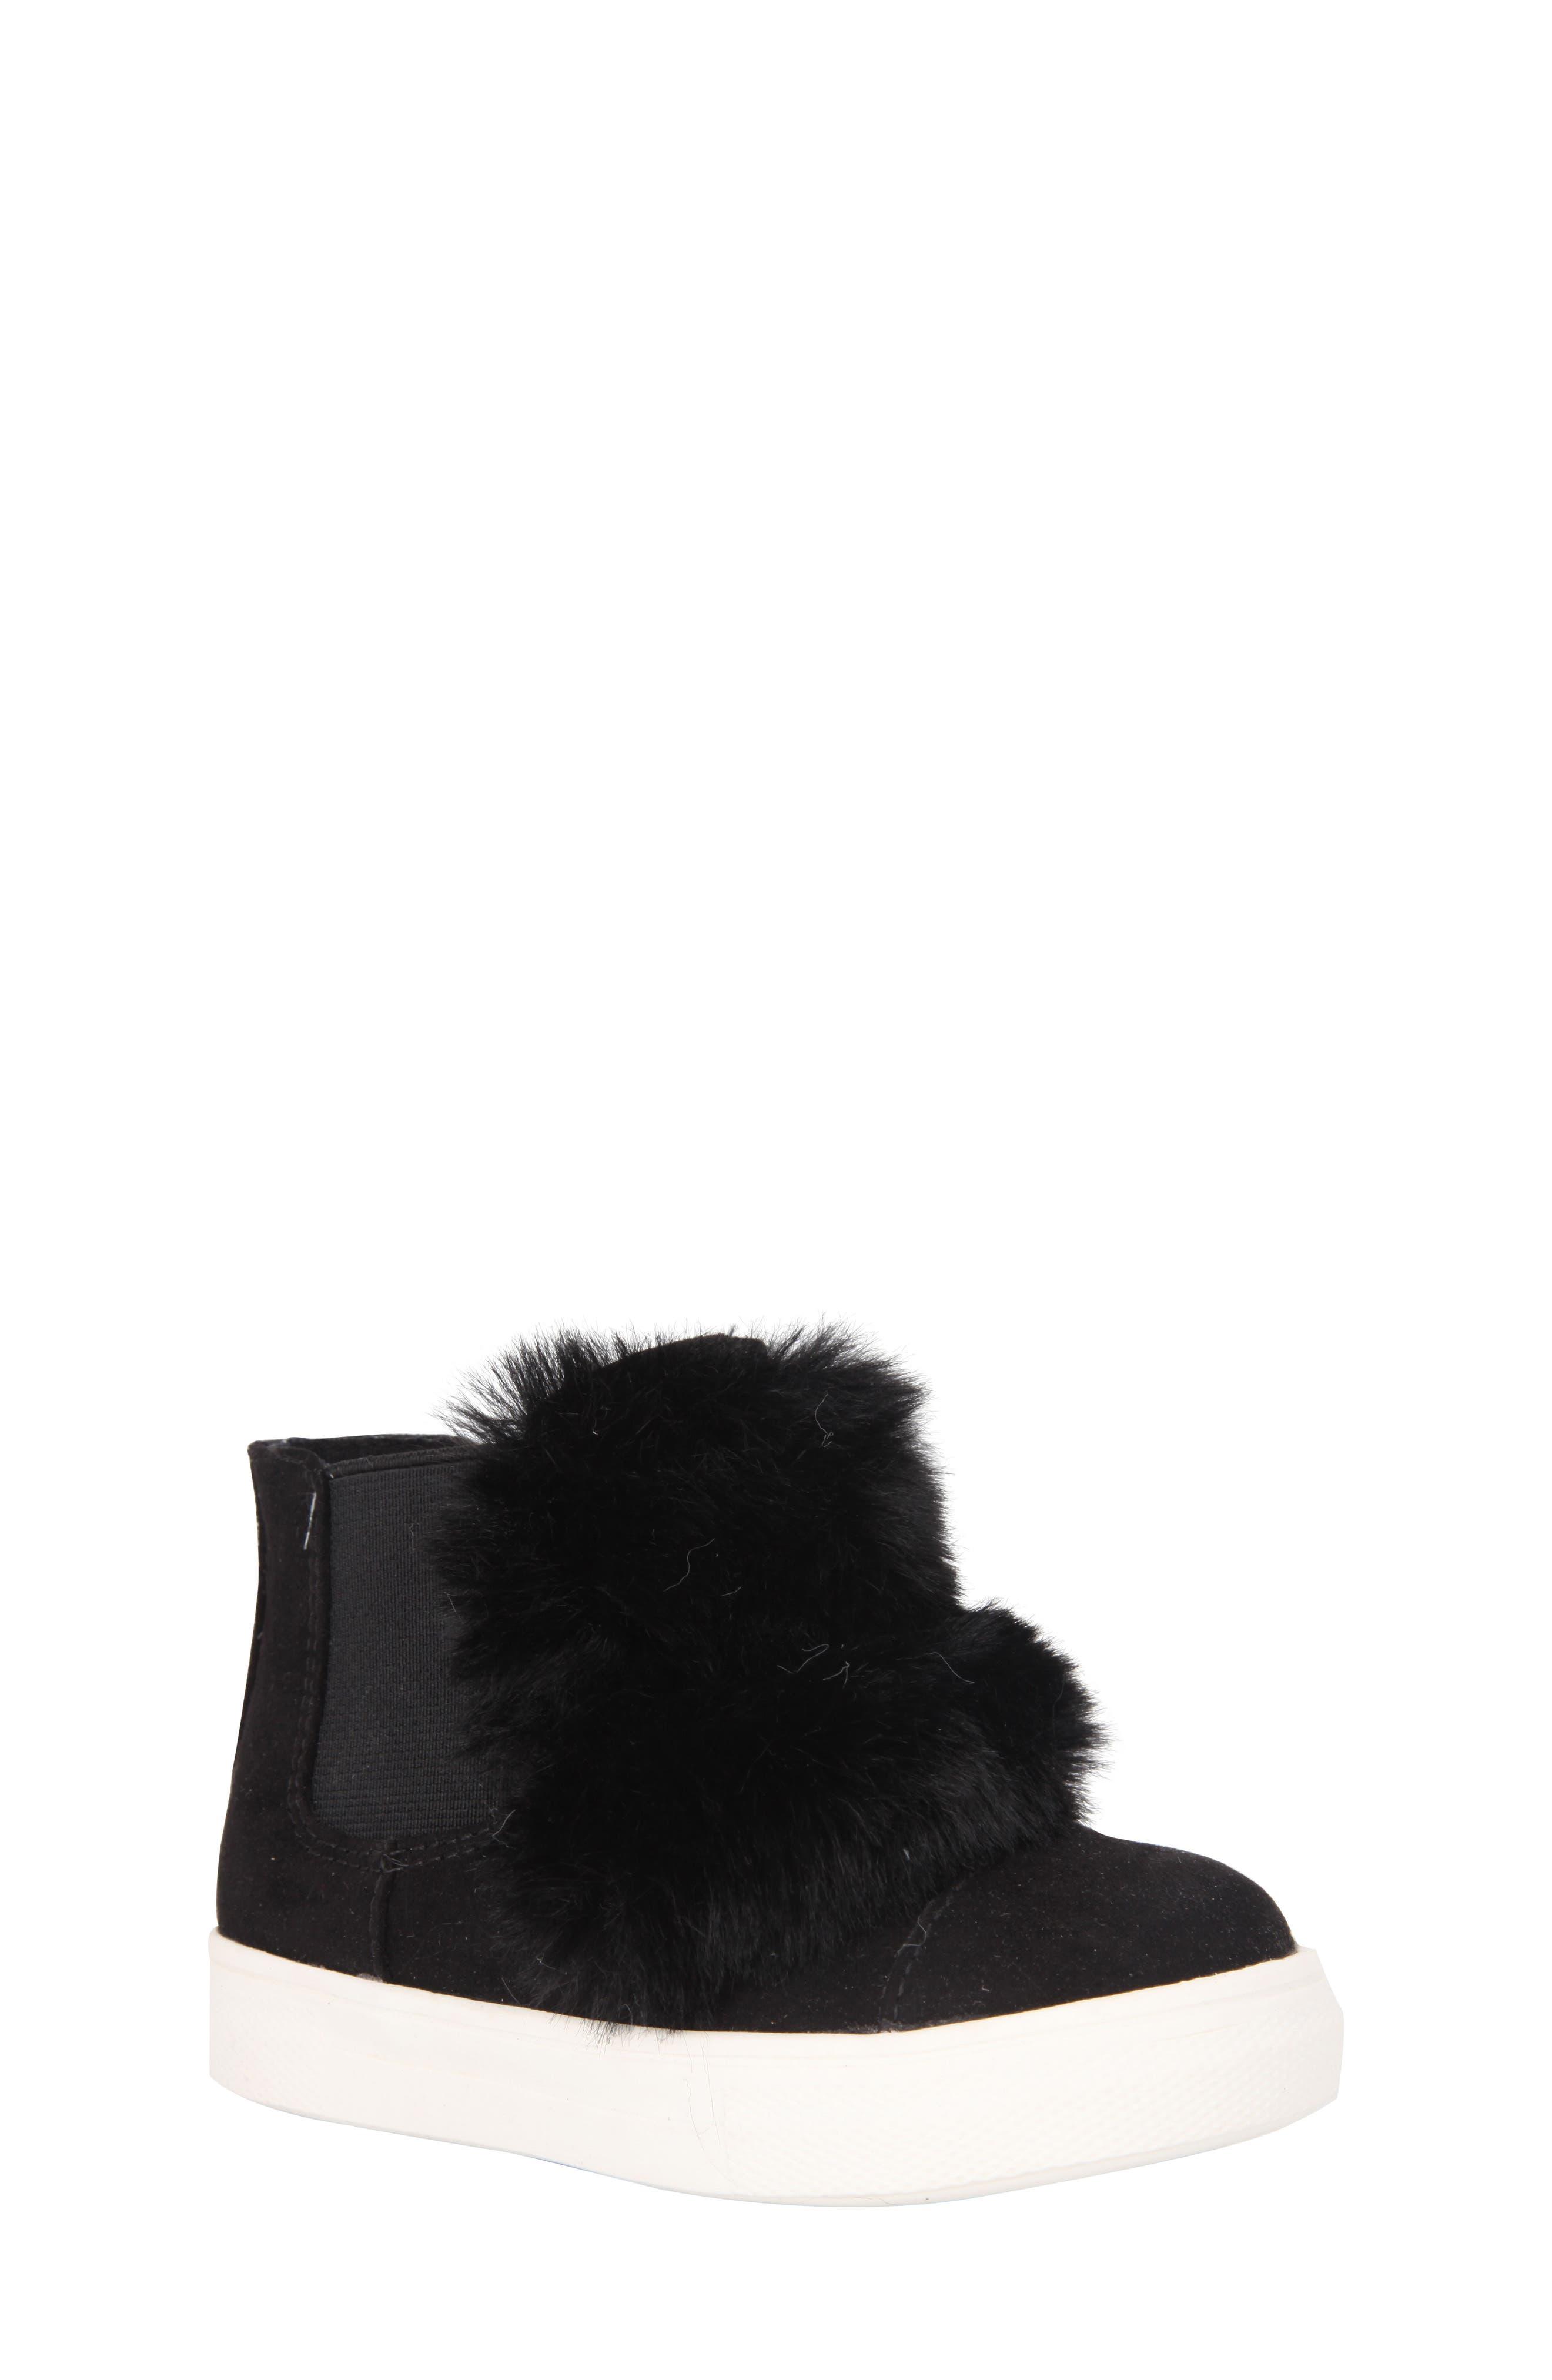 Helen Faux Fur Bootie Sneaker,                         Main,                         color, Black Microsuede